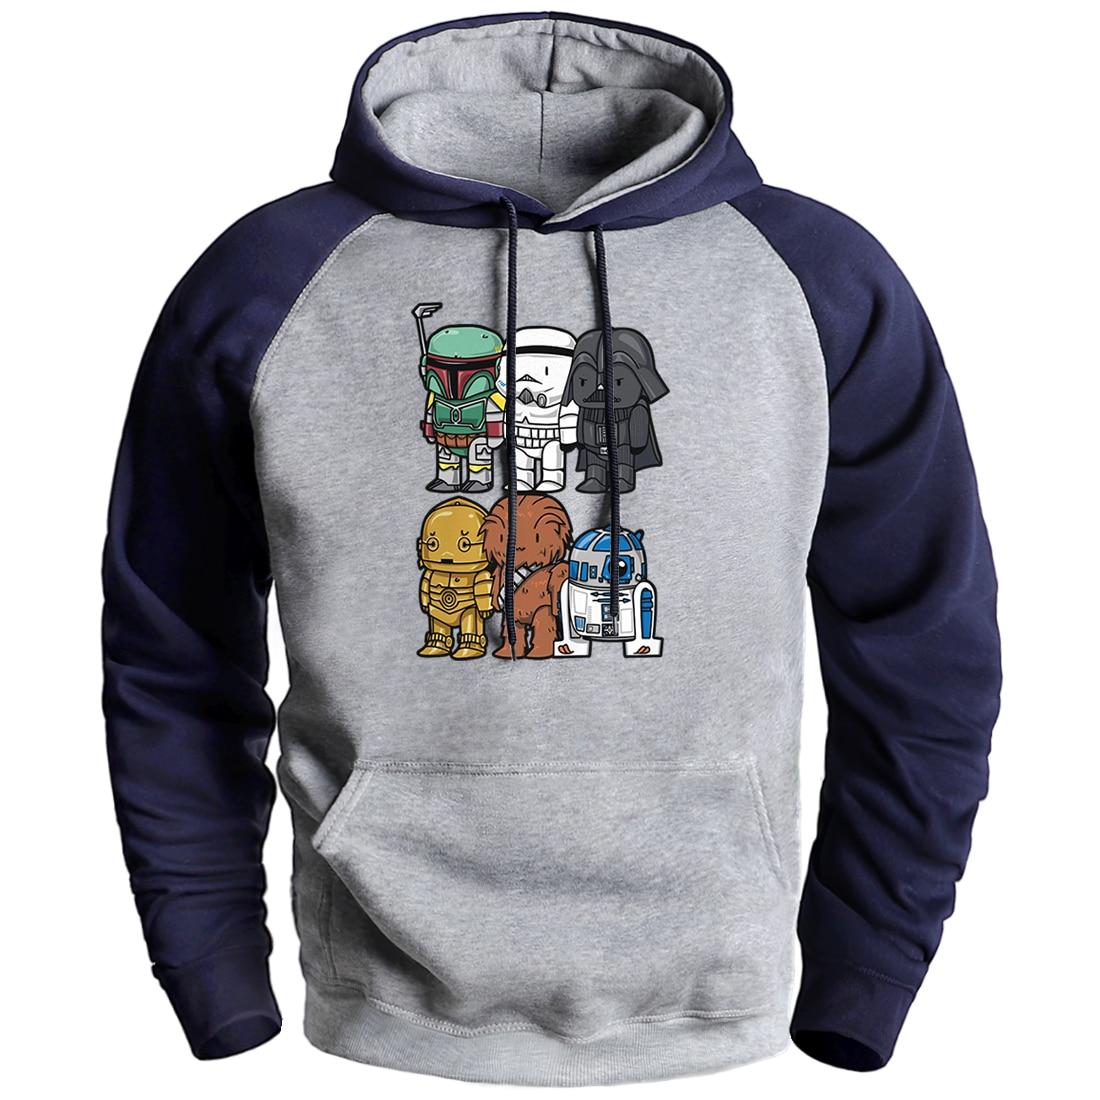 Yoda Darth Vader Hooded Sweatshirts Star Wars Fashion Cool Raglan Pullover Hoodies Men Winter Autumn Fleece Starwars Hoodies Top